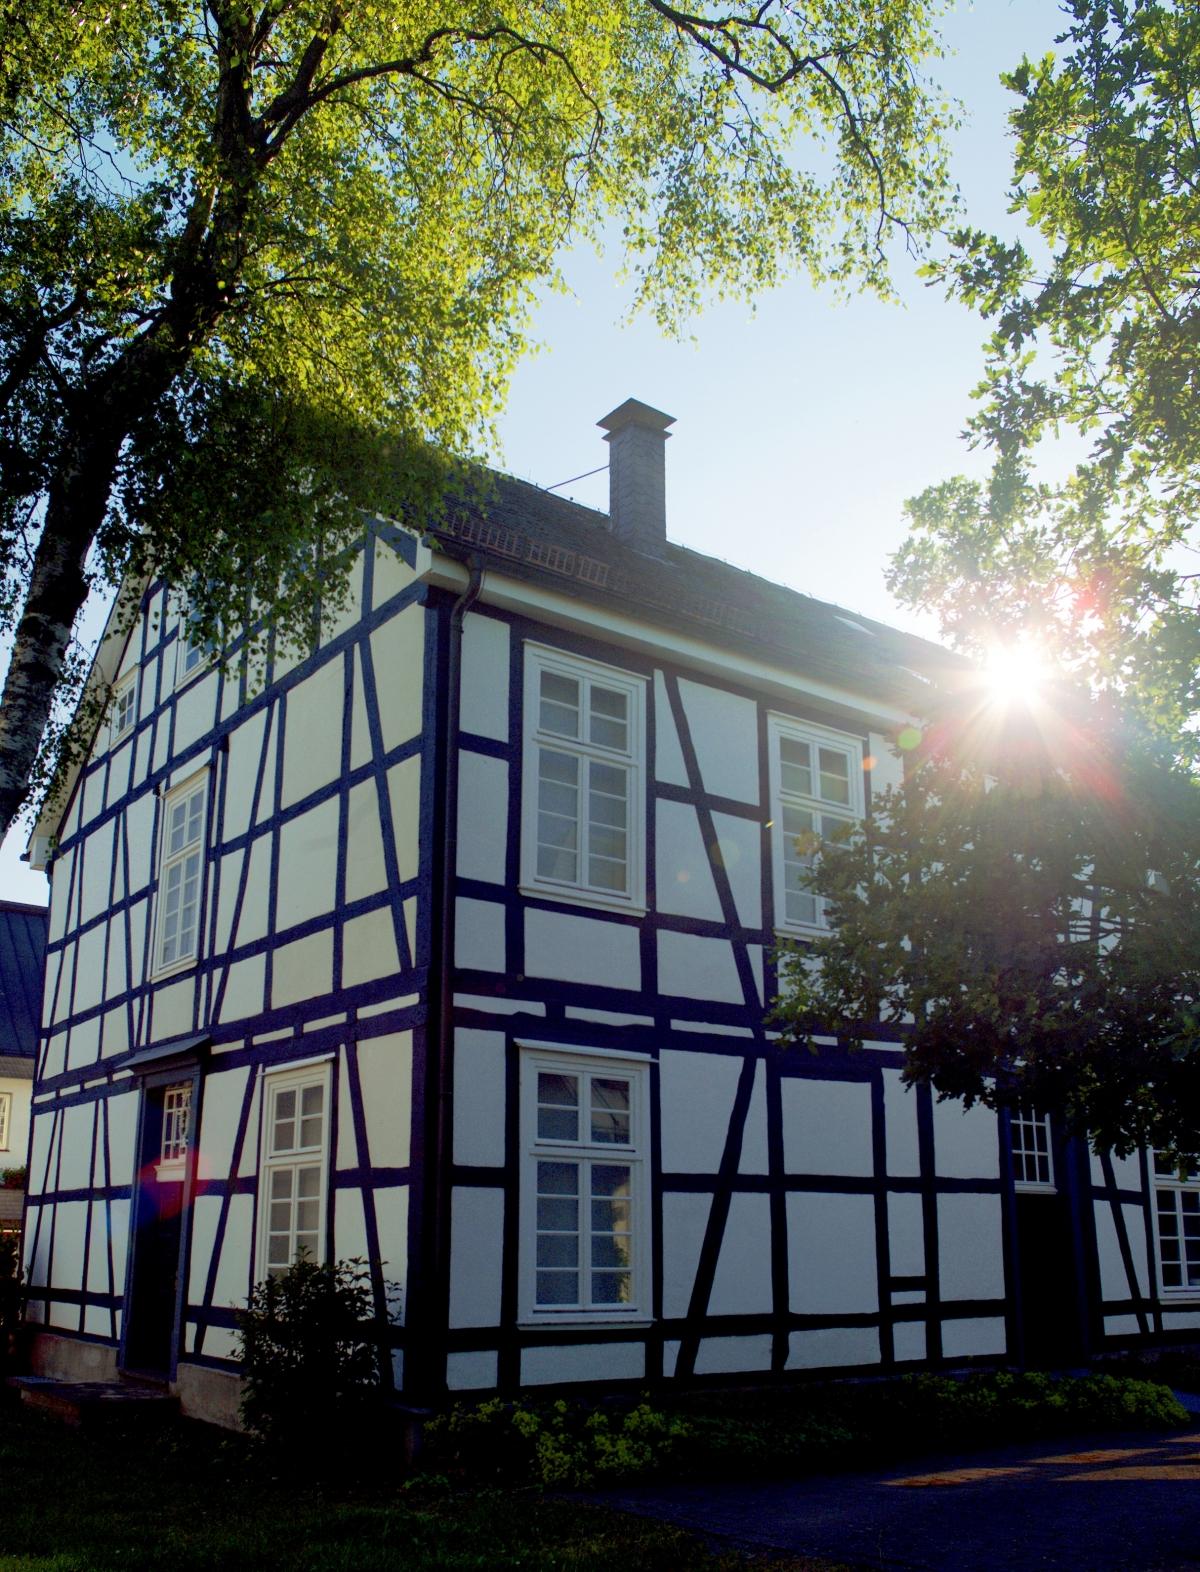 Stedelijk museum Medebach